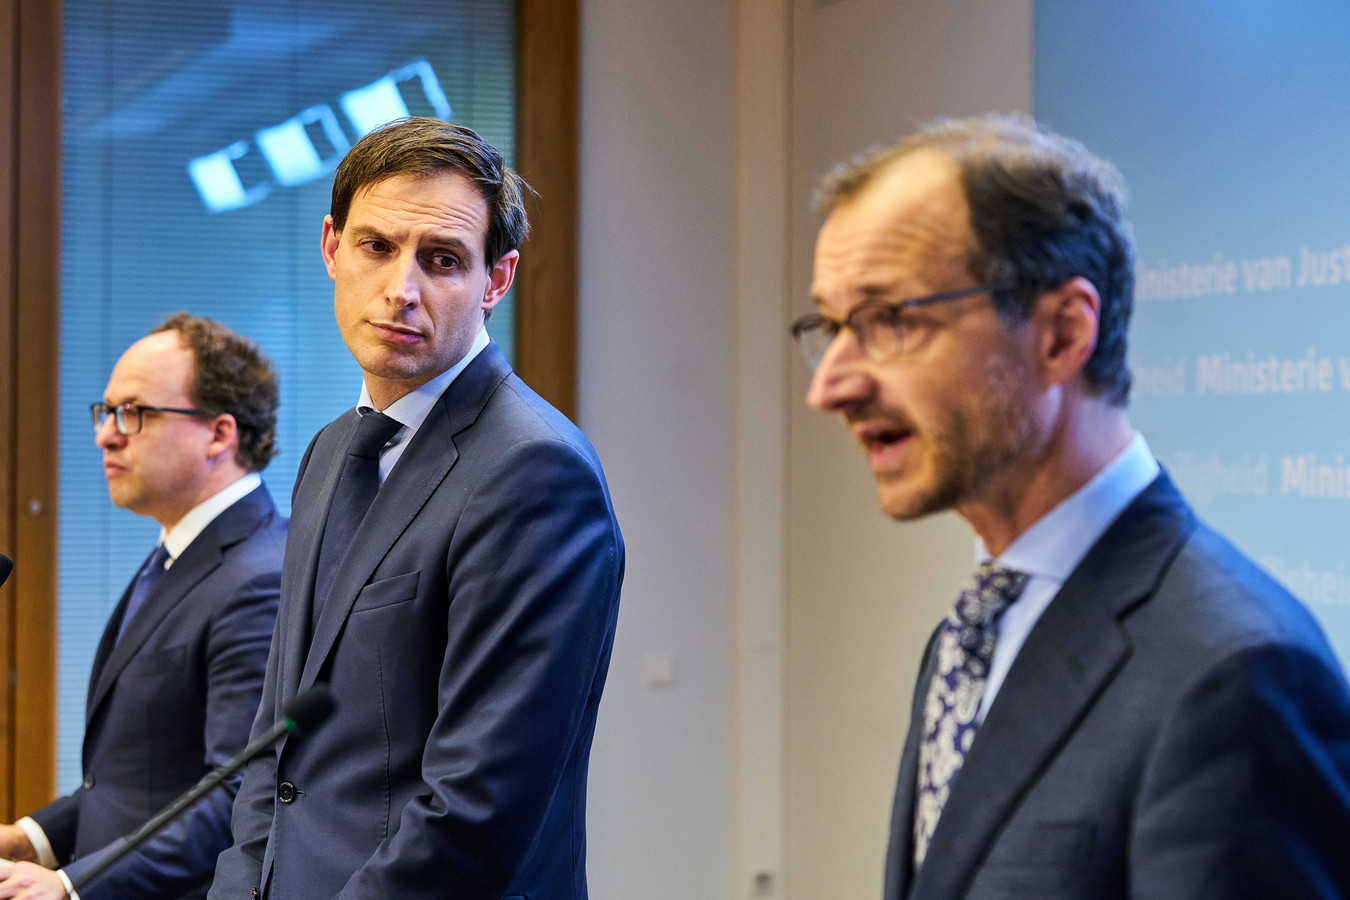 Van links naar rechts: ministers Koolmees, Hoekstra en Wiebes.